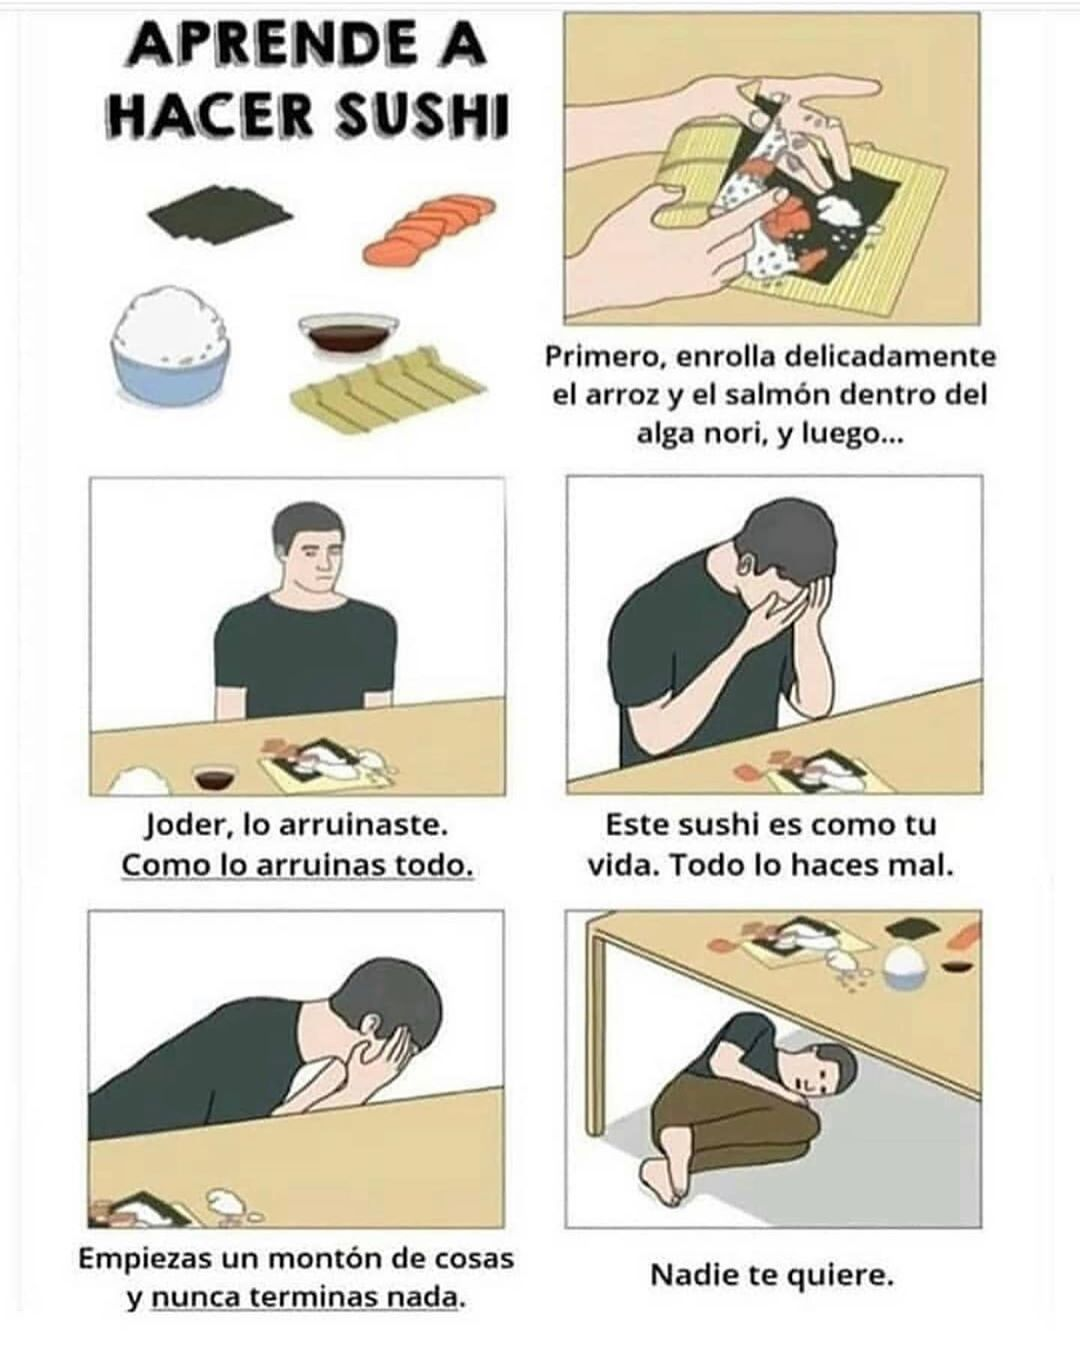 Meme Memeenespanol Memes Chile Memeslatinos Memesespanol Argentina Peru Uruguay Paraguay Bolivia Ecuador Ve How To Make Sushi Kpop Funny Haha Funny